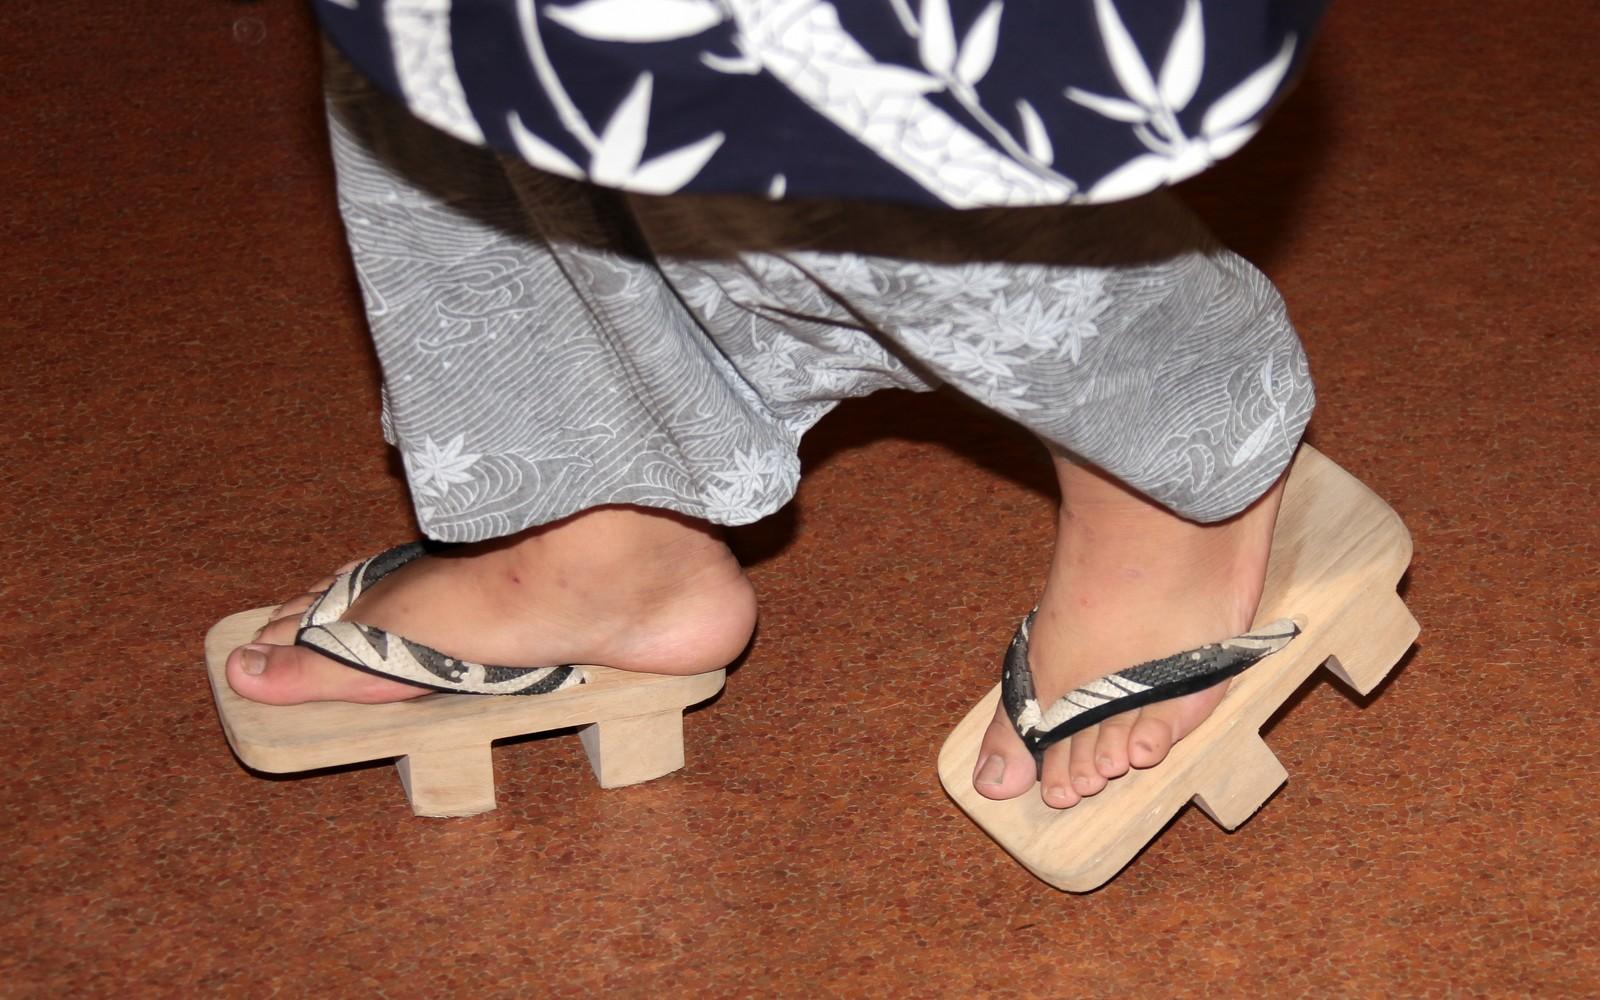 sumo portant des geta chaussures en bois. Black Bedroom Furniture Sets. Home Design Ideas